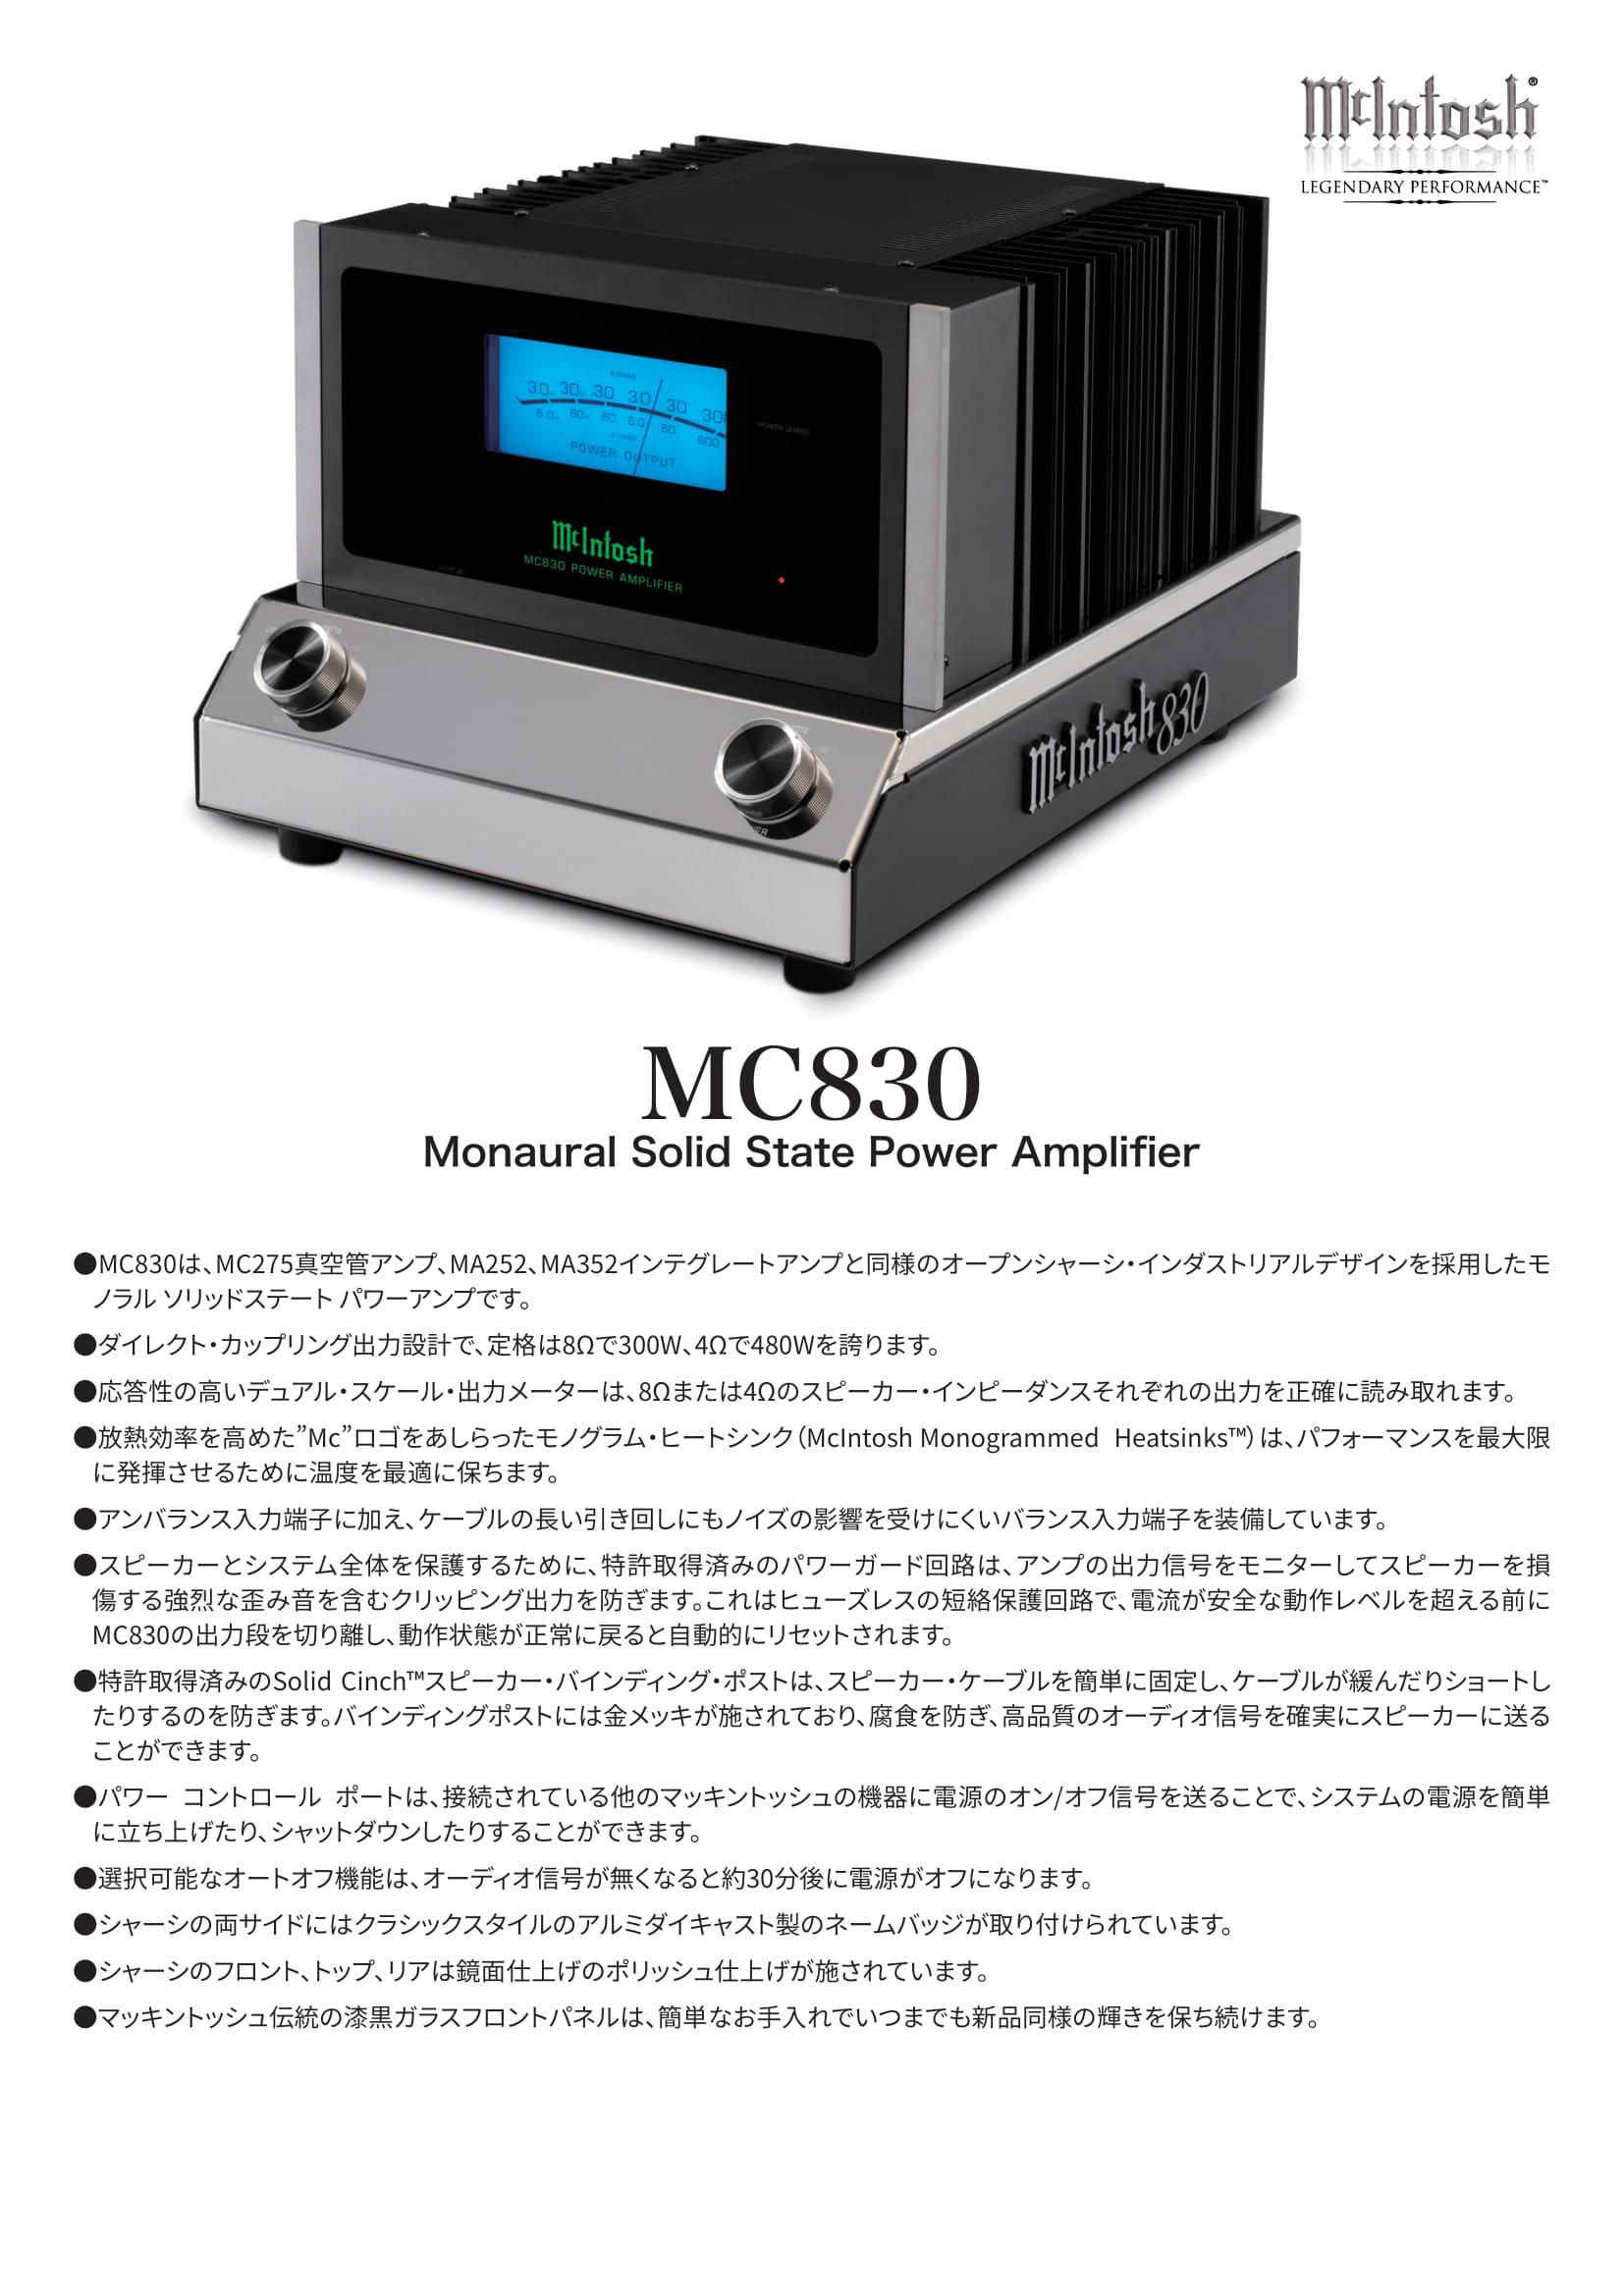 McIntosh_4-1.jpg